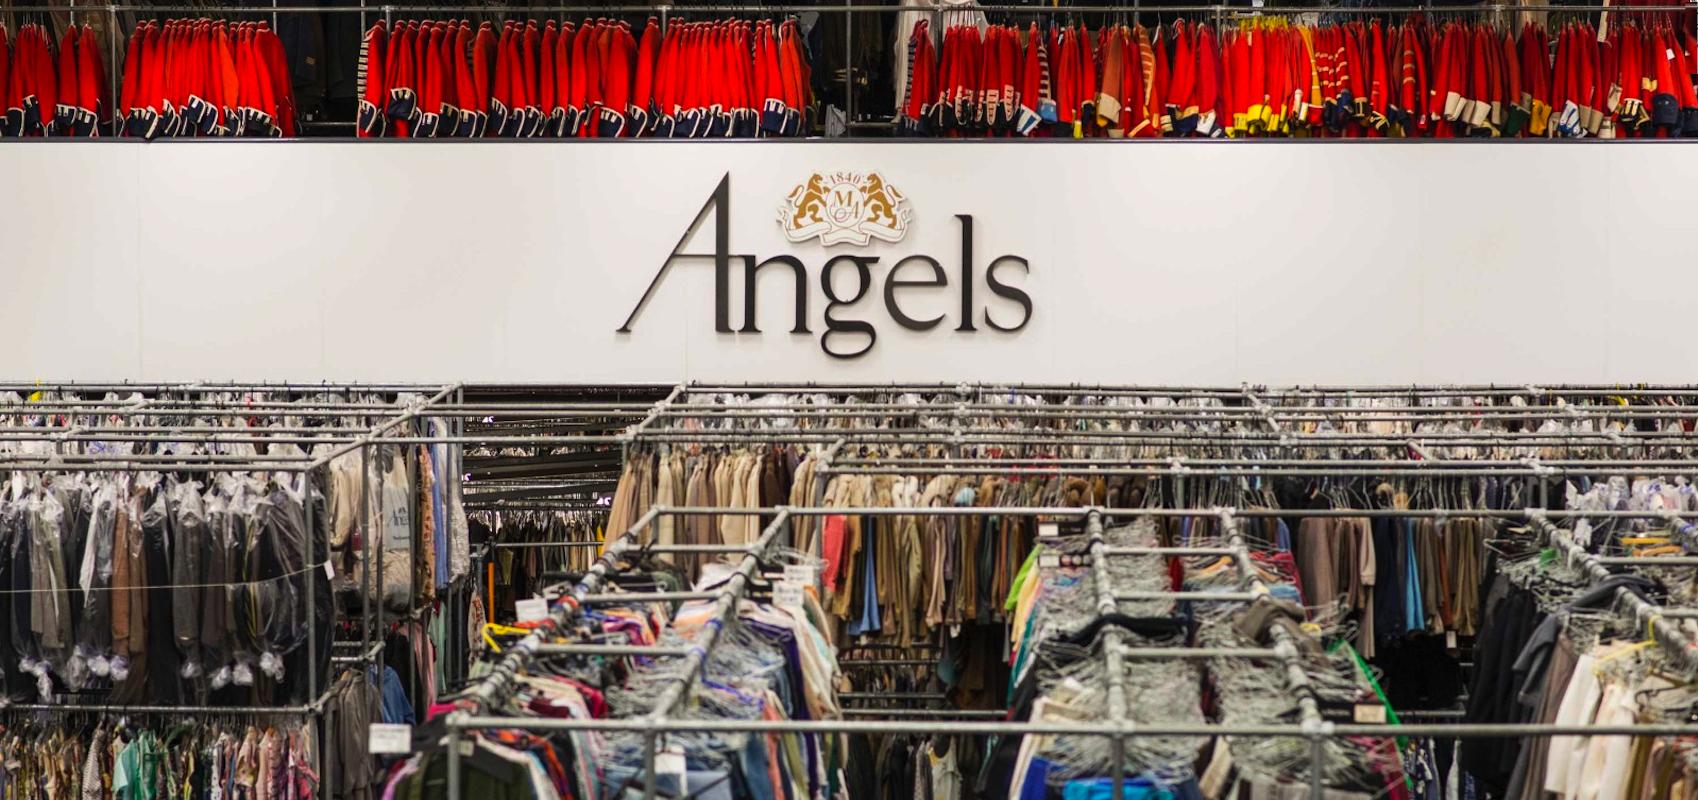 Angels Warehouse